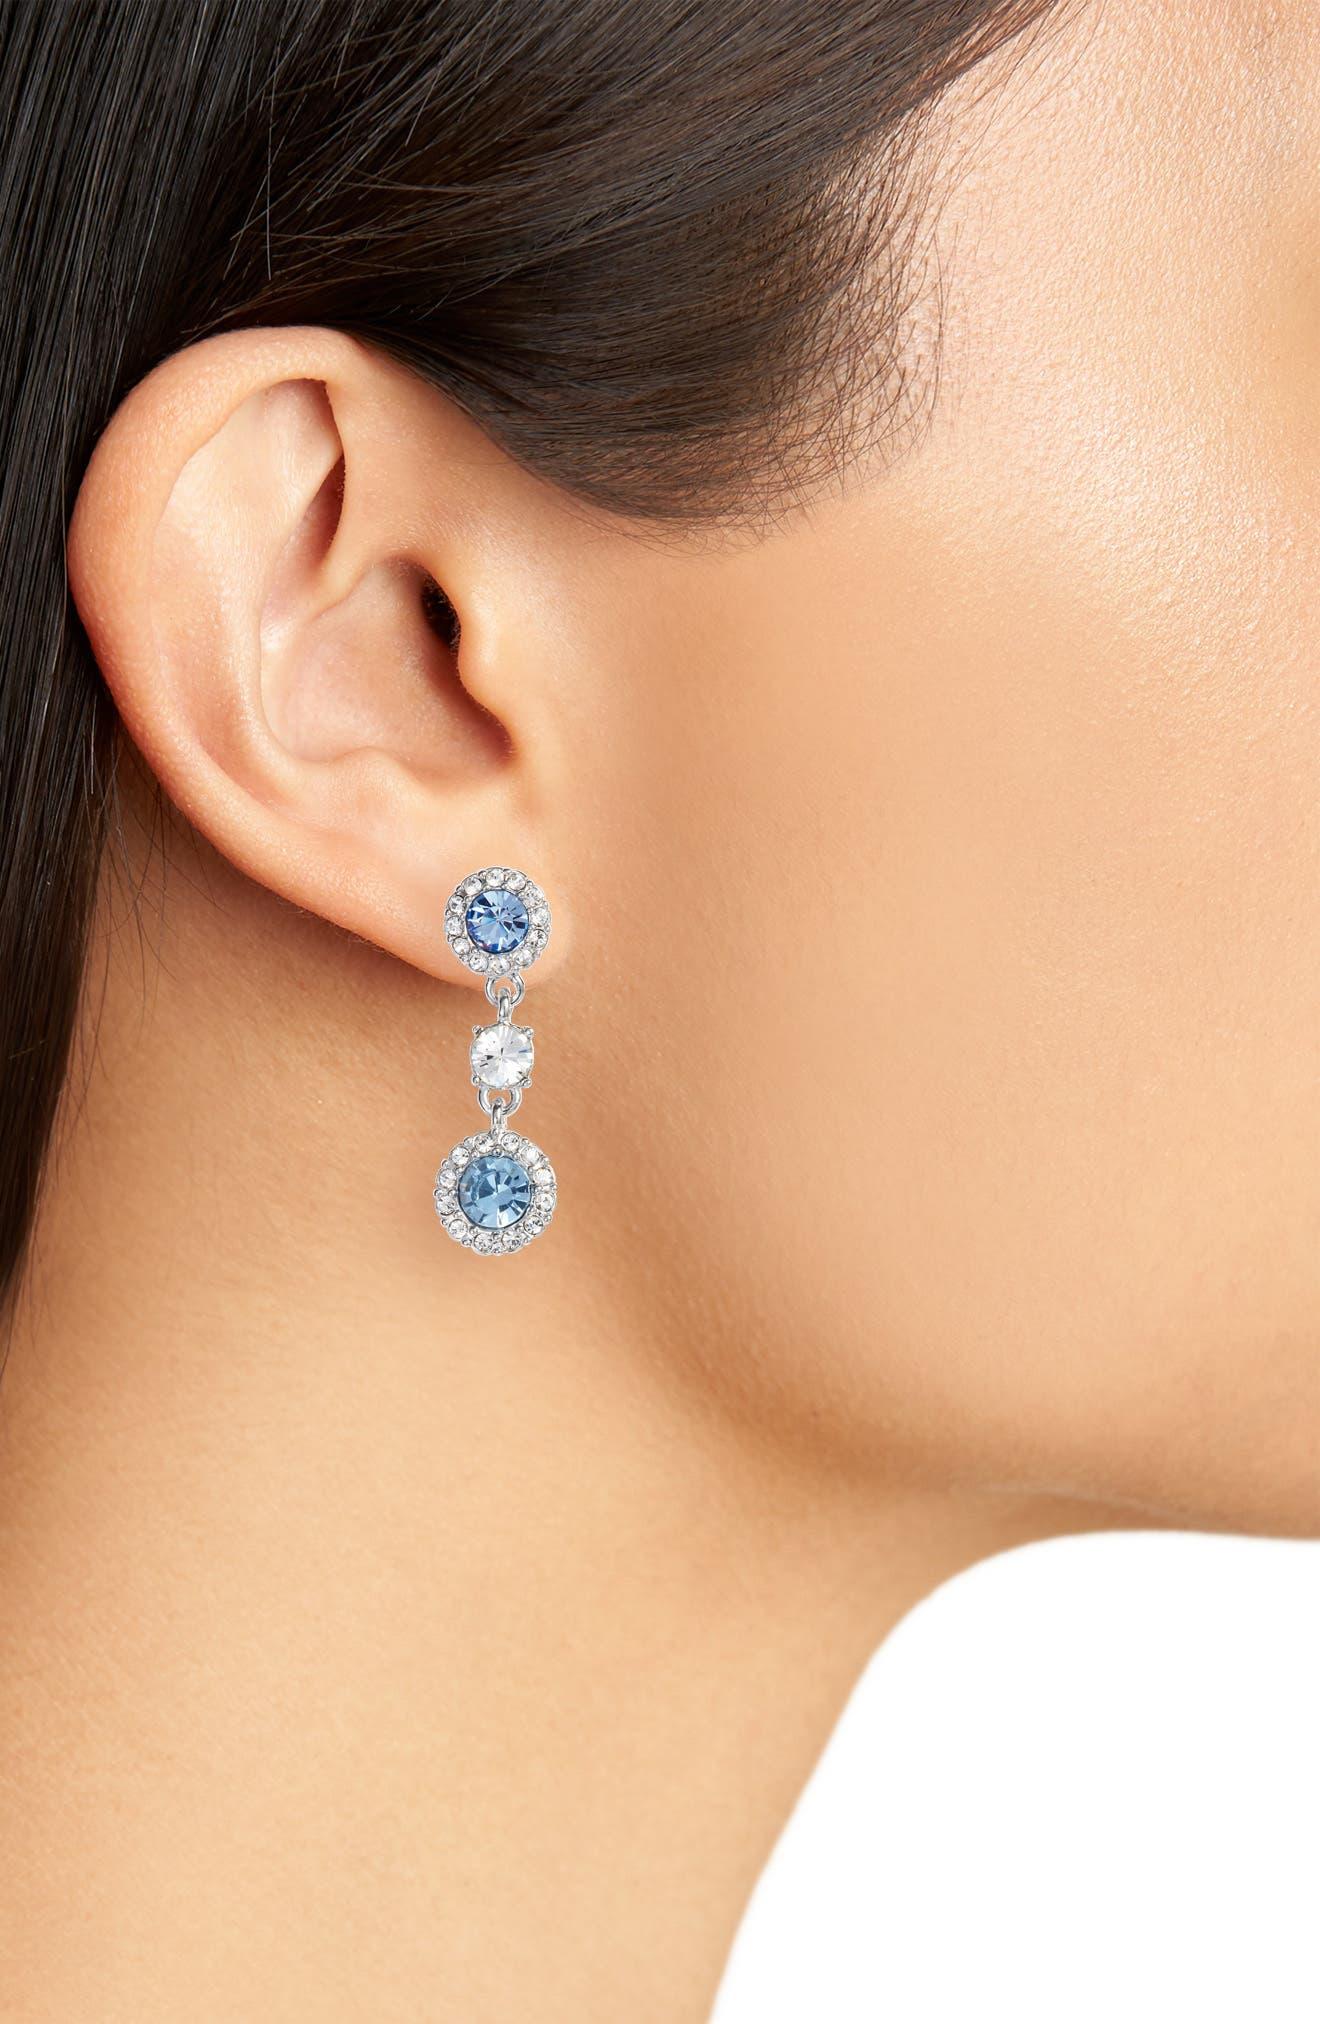 Swarovski Crystal Triple Drop Earrings,                             Alternate thumbnail 2, color,                             SILVER/ SAPPHIRE/ CRYSTAL